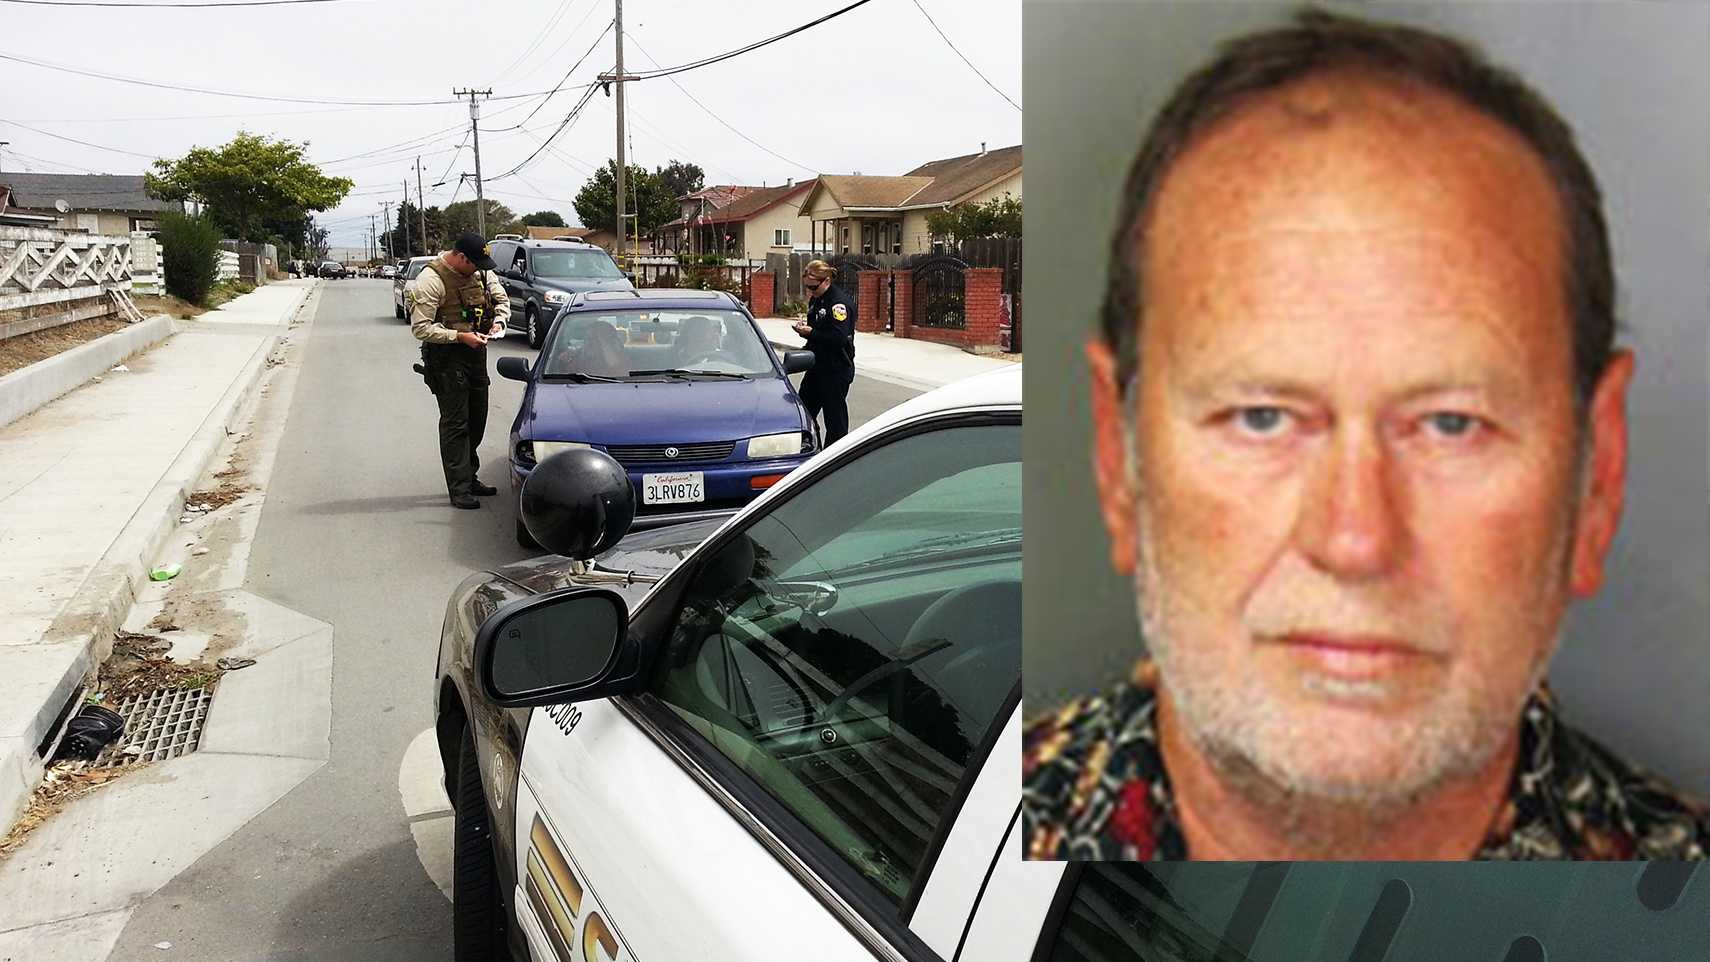 Donald Wayne Crisp, 58, was shot on this street outside his Salinas home.